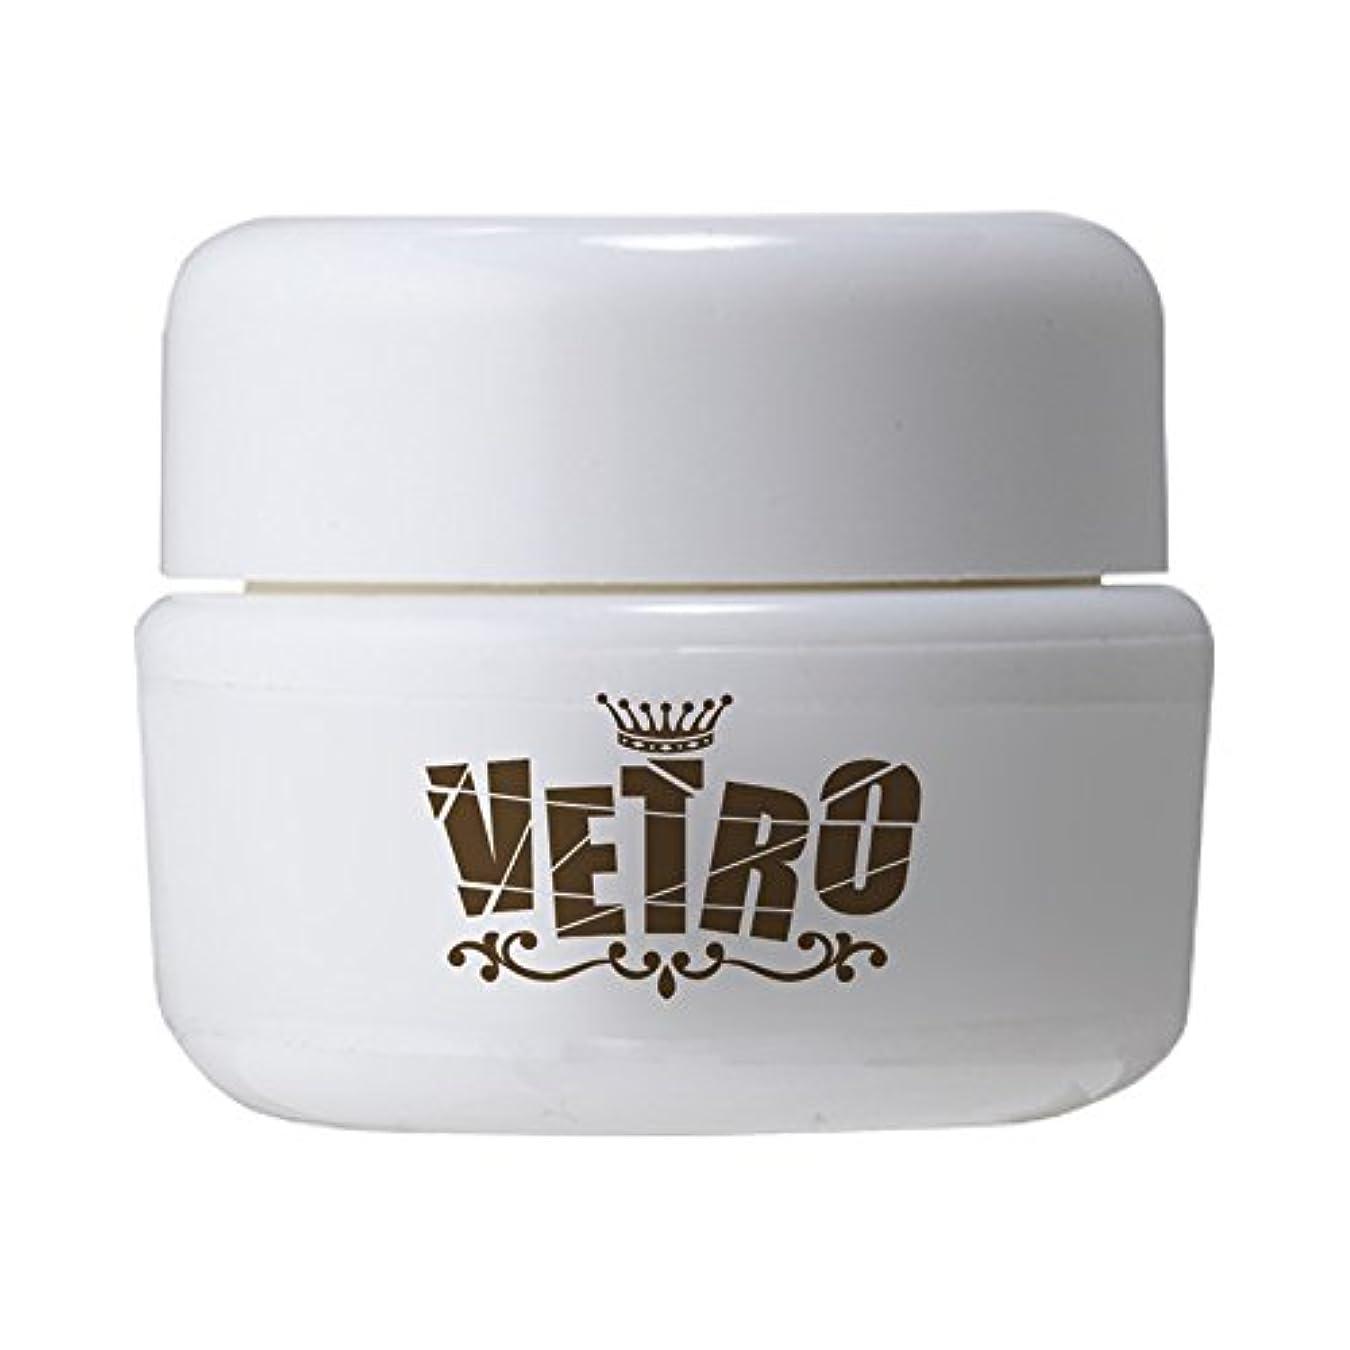 VETRO No.19 カラージェル シアー VL321 クリスタマーメイド 4ml